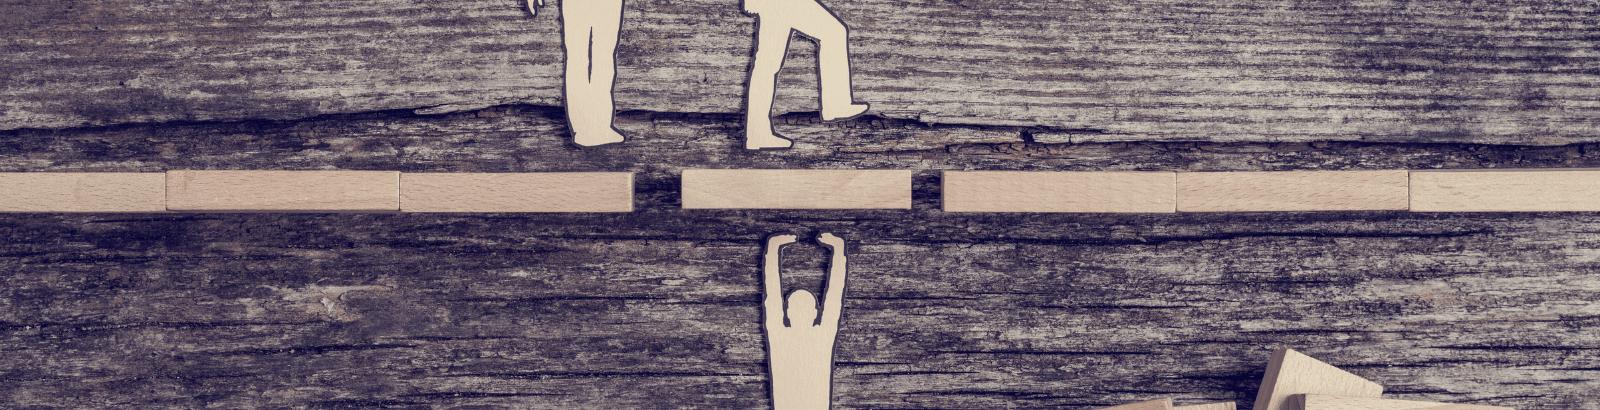 Work-Life Balance OpenGrowth